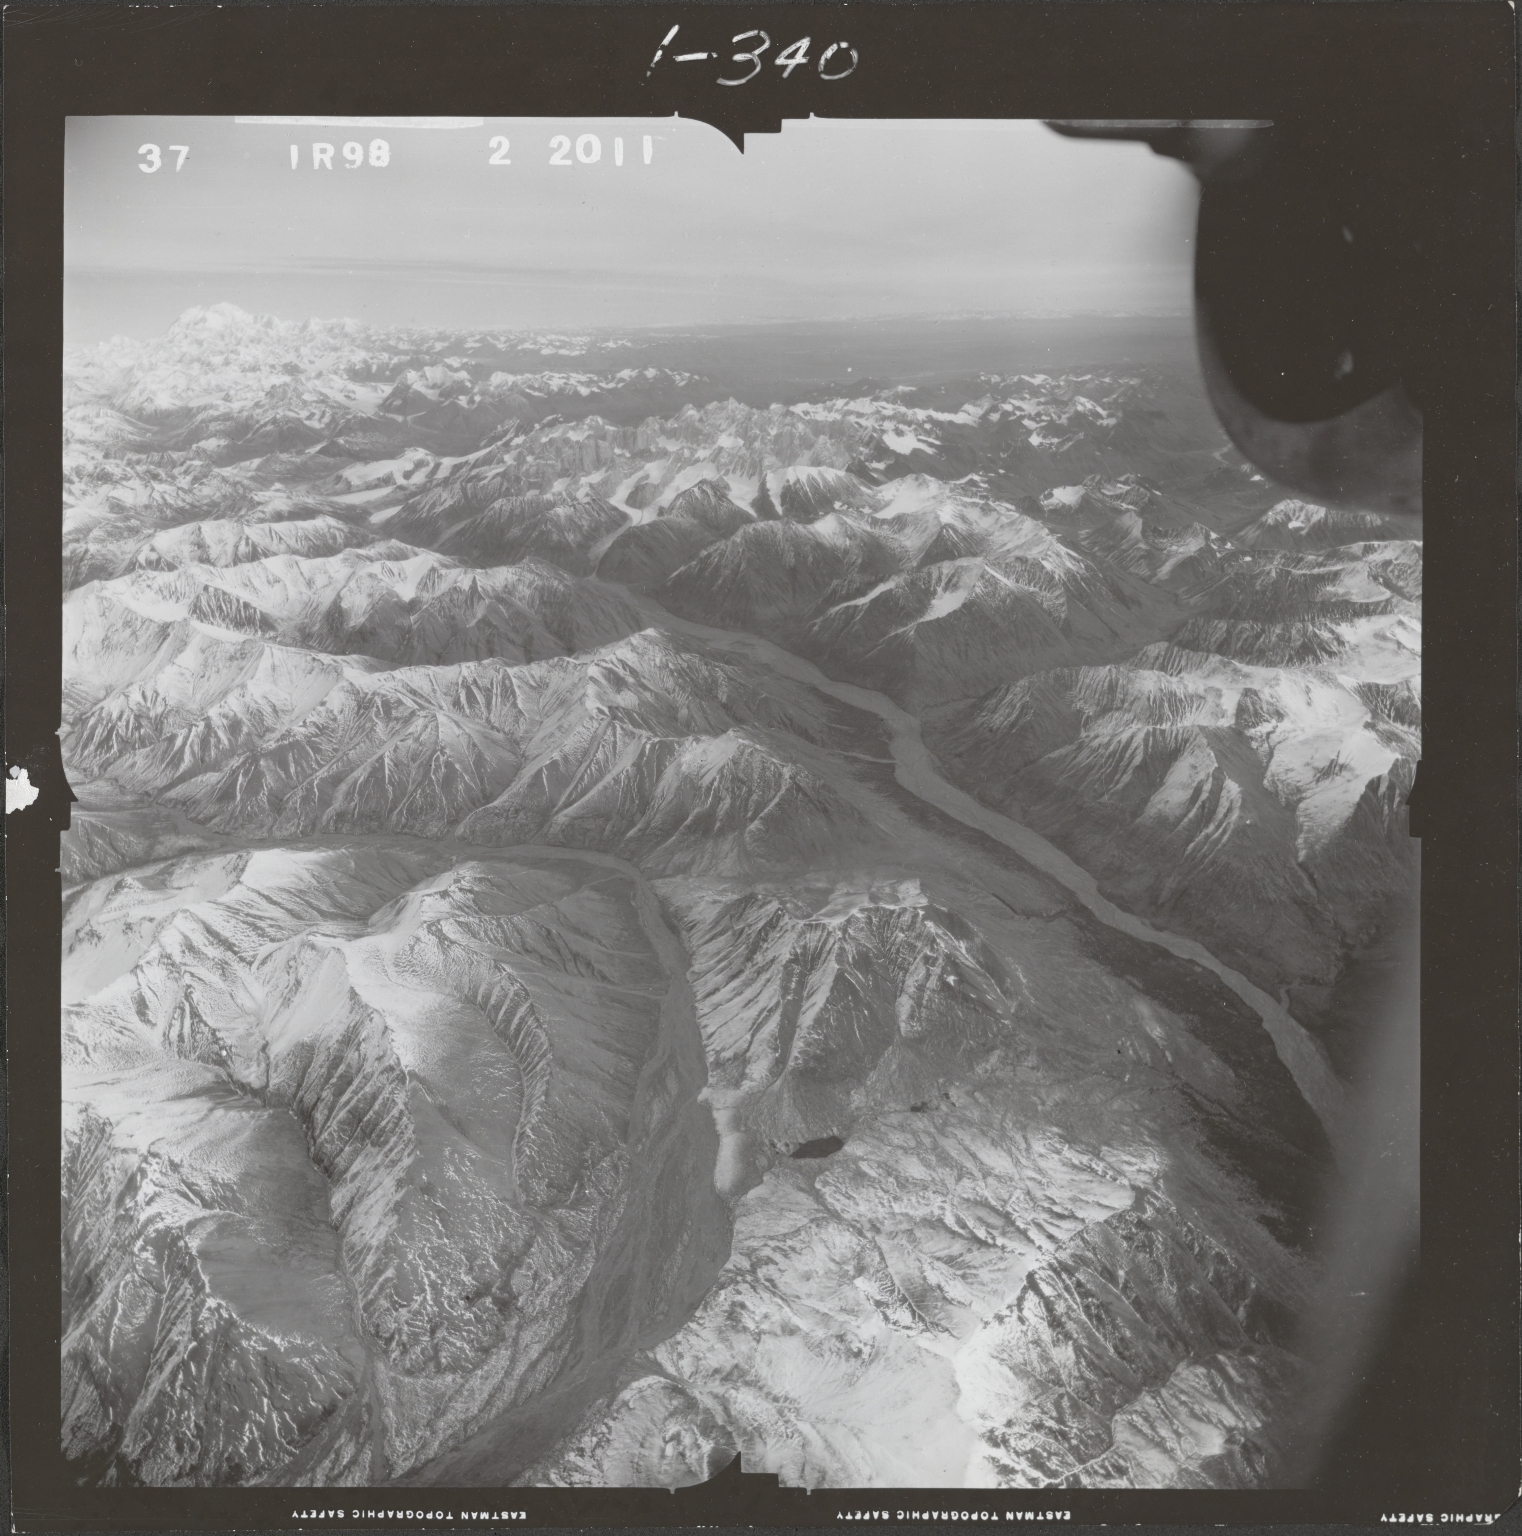 Kuskokwim, aerial photograph FL 68 R-98, Alaska